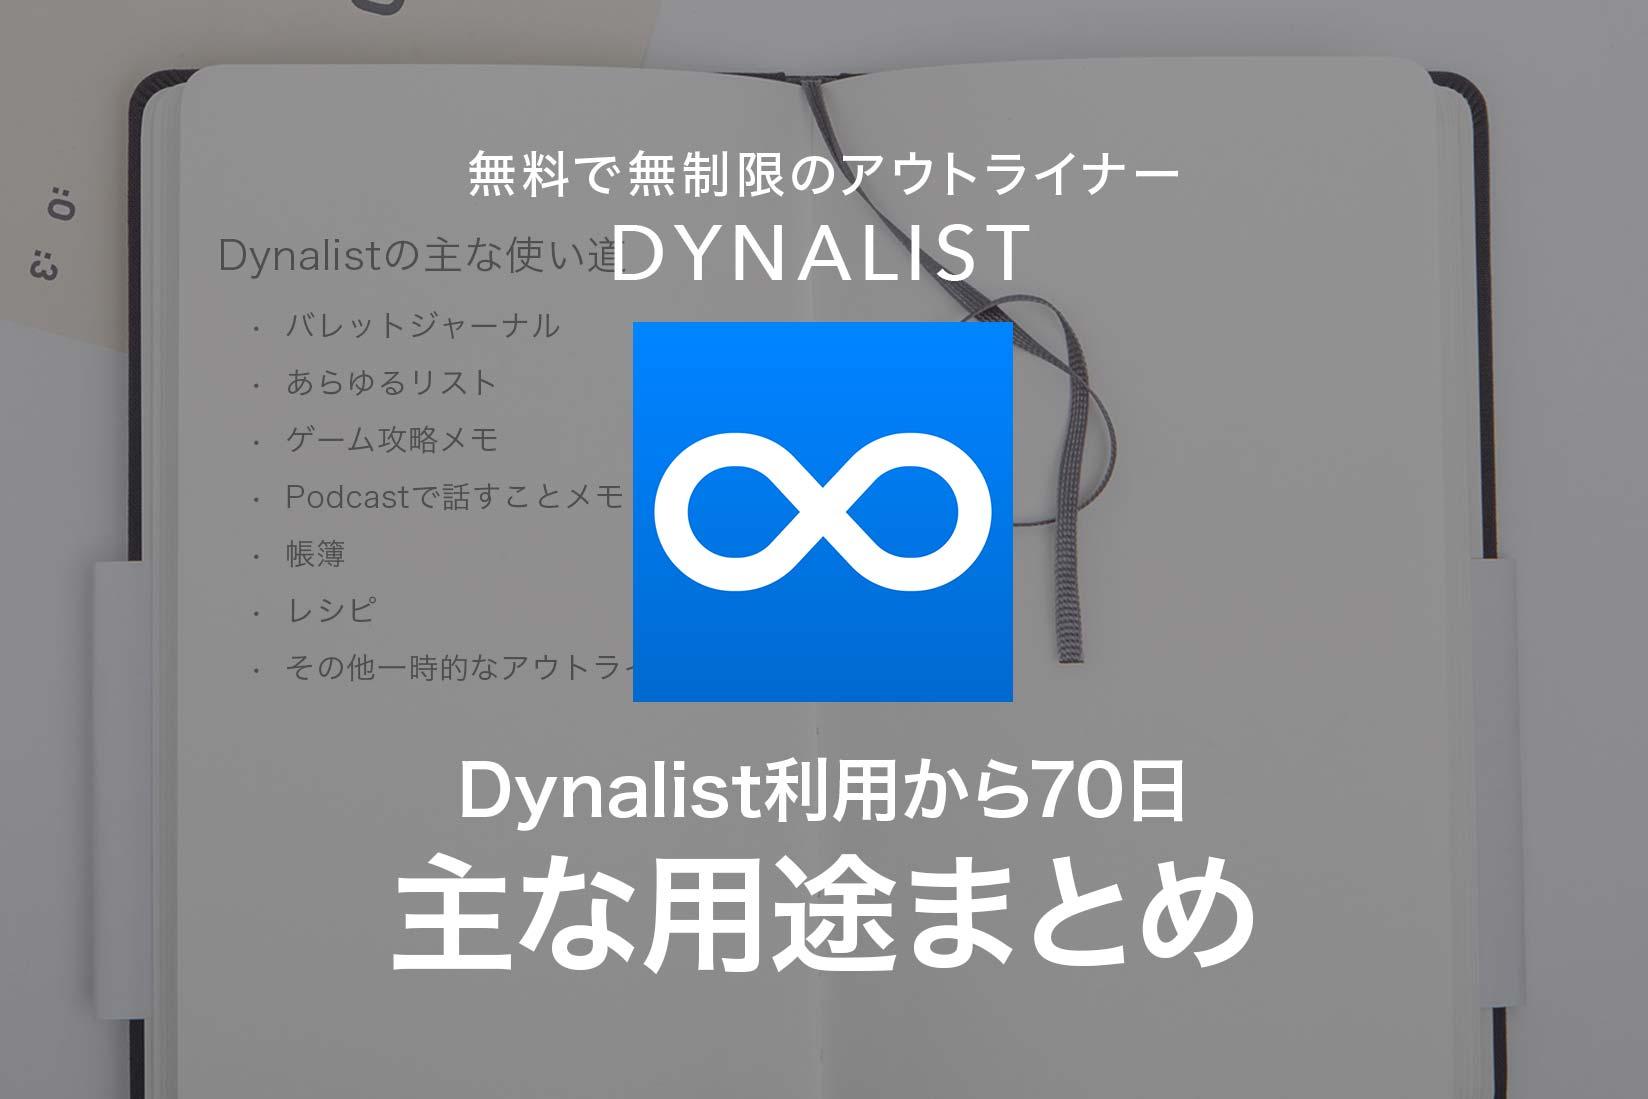 Dynalist70日主な用途まとめ